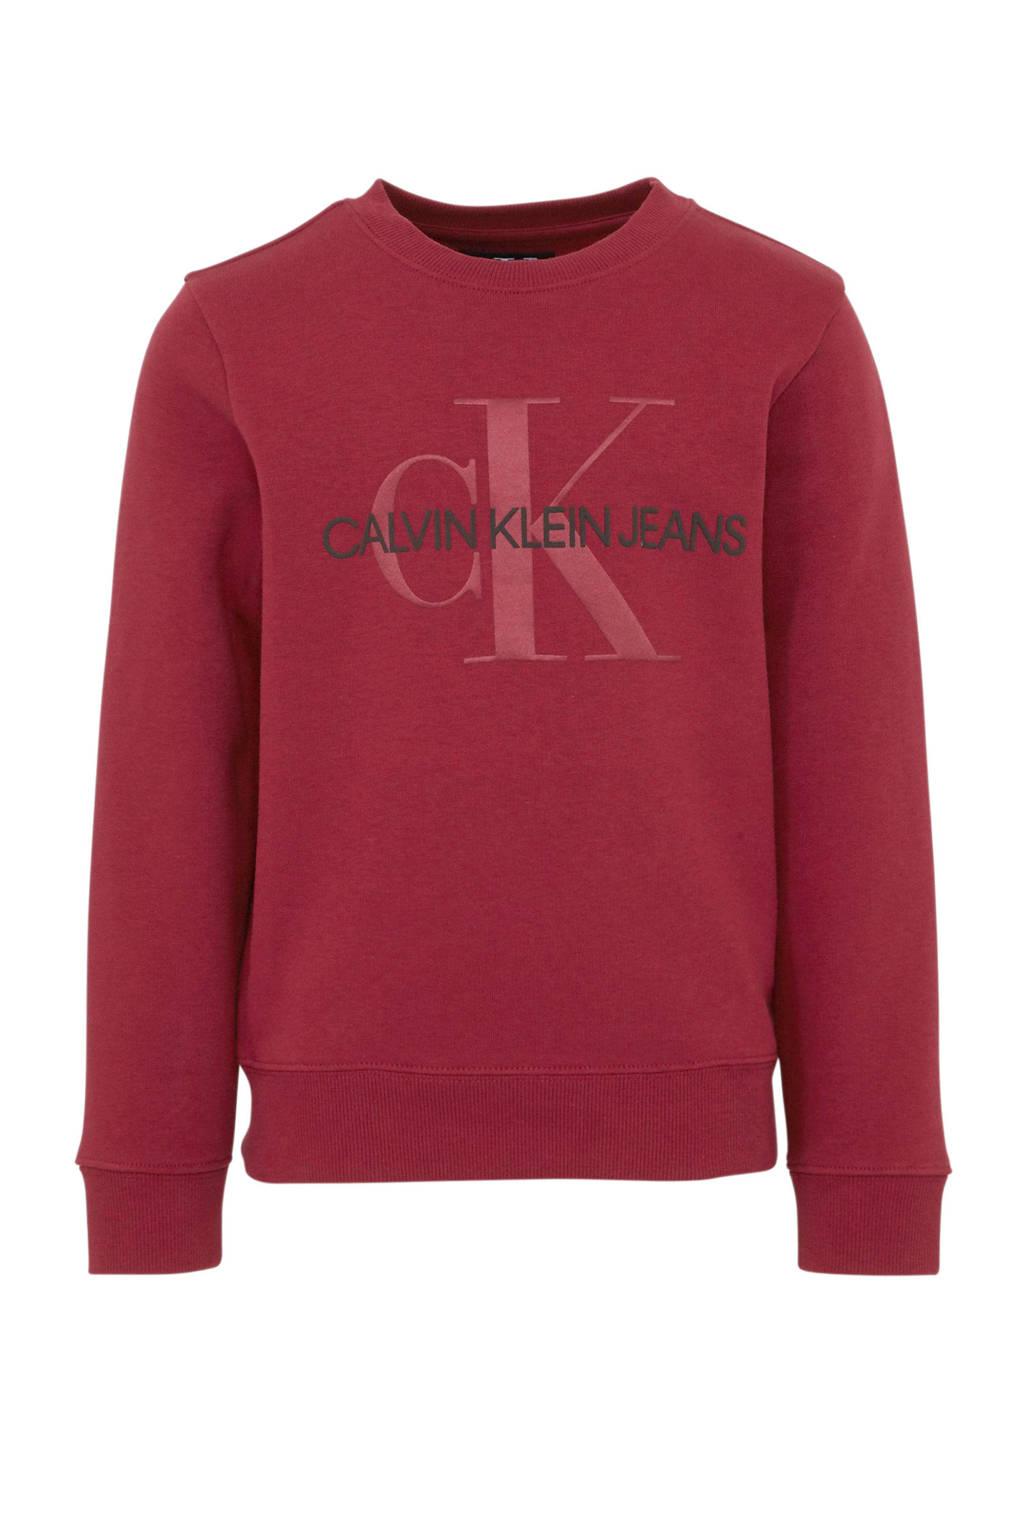 CALVIN KLEIN JEANS sweater met logo donkerrood, Donkerrood